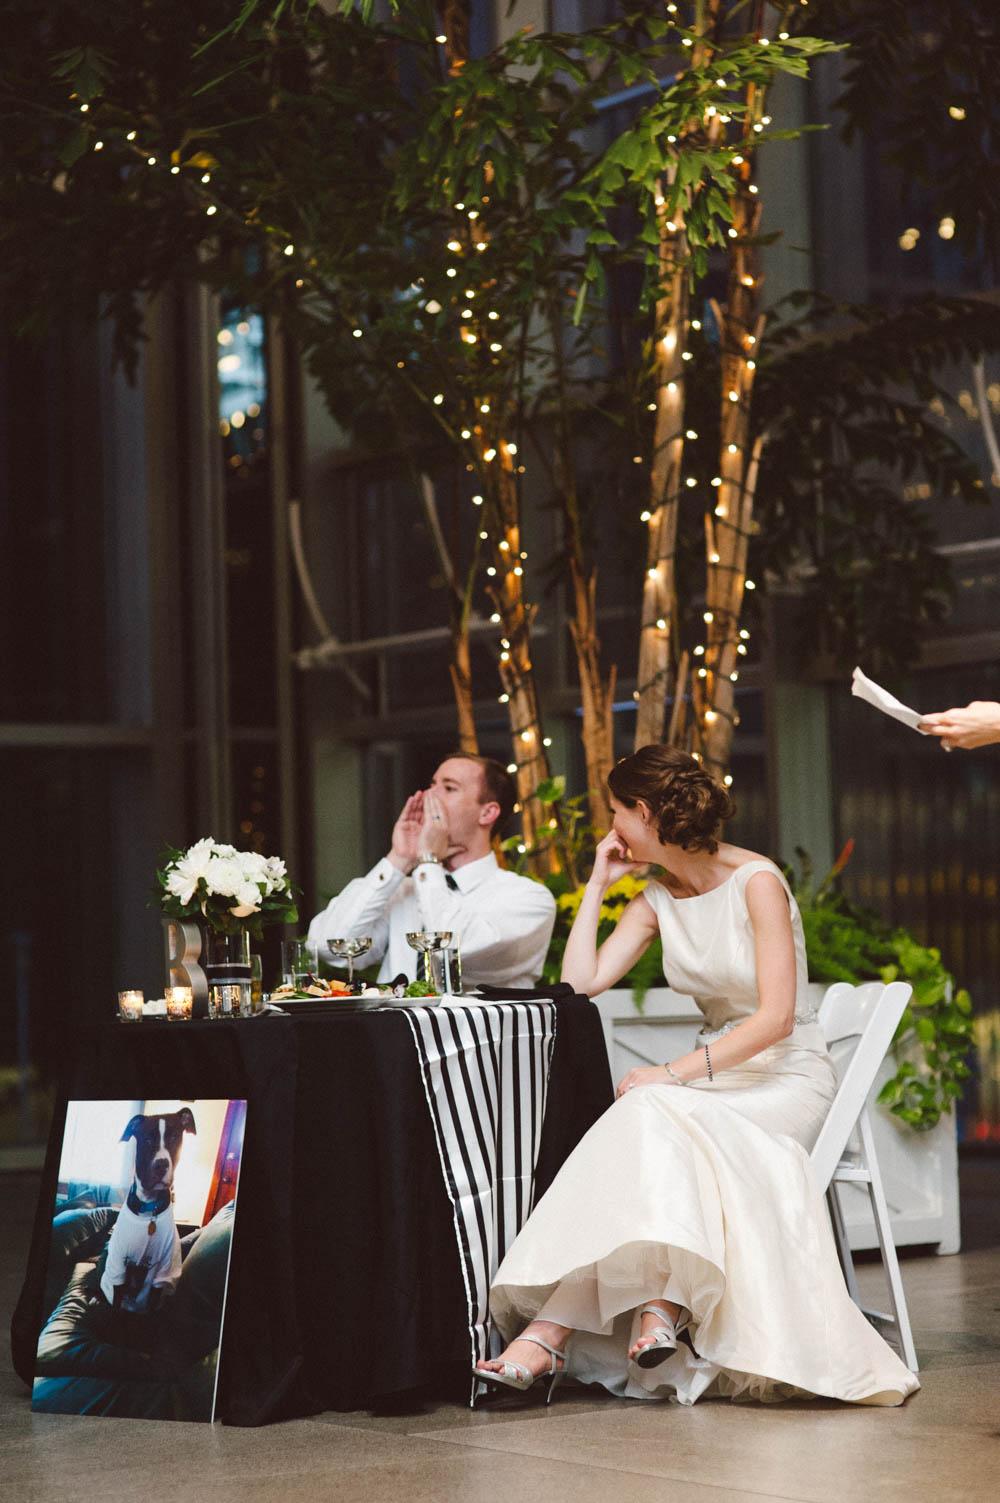 wintergarden-wedding-pittsburgh-131.jpg